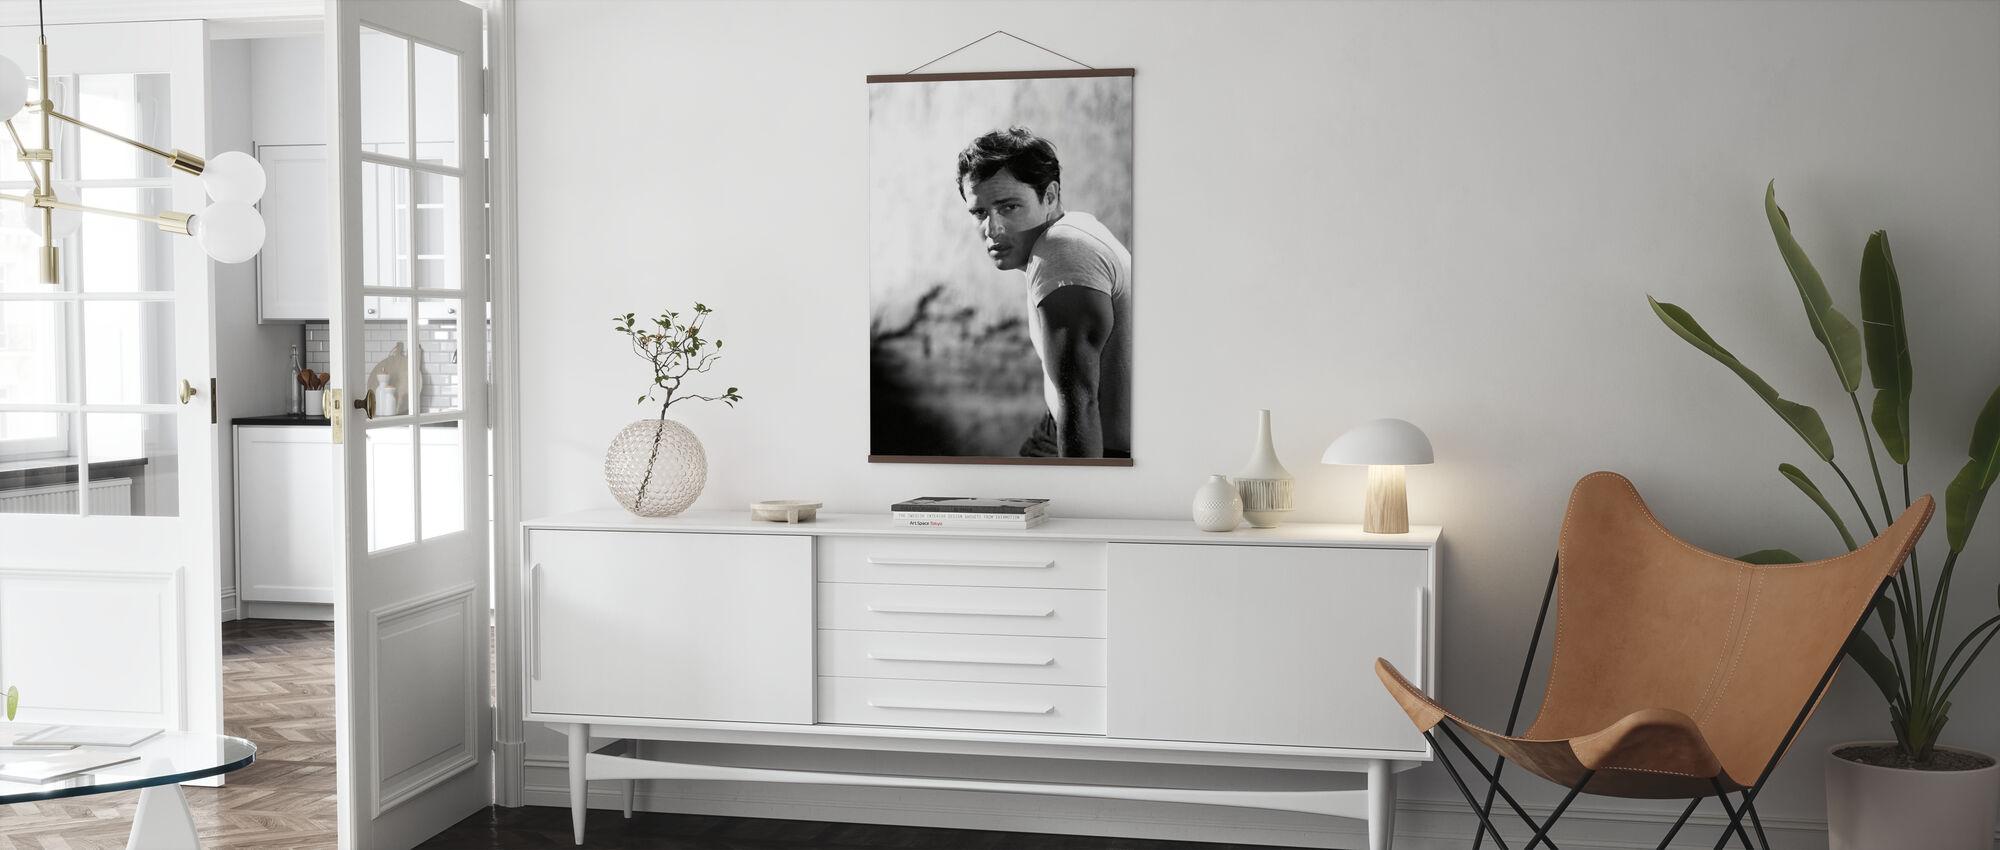 Marlon Brando in a Streetcar Named Desire - Poster - Living Room